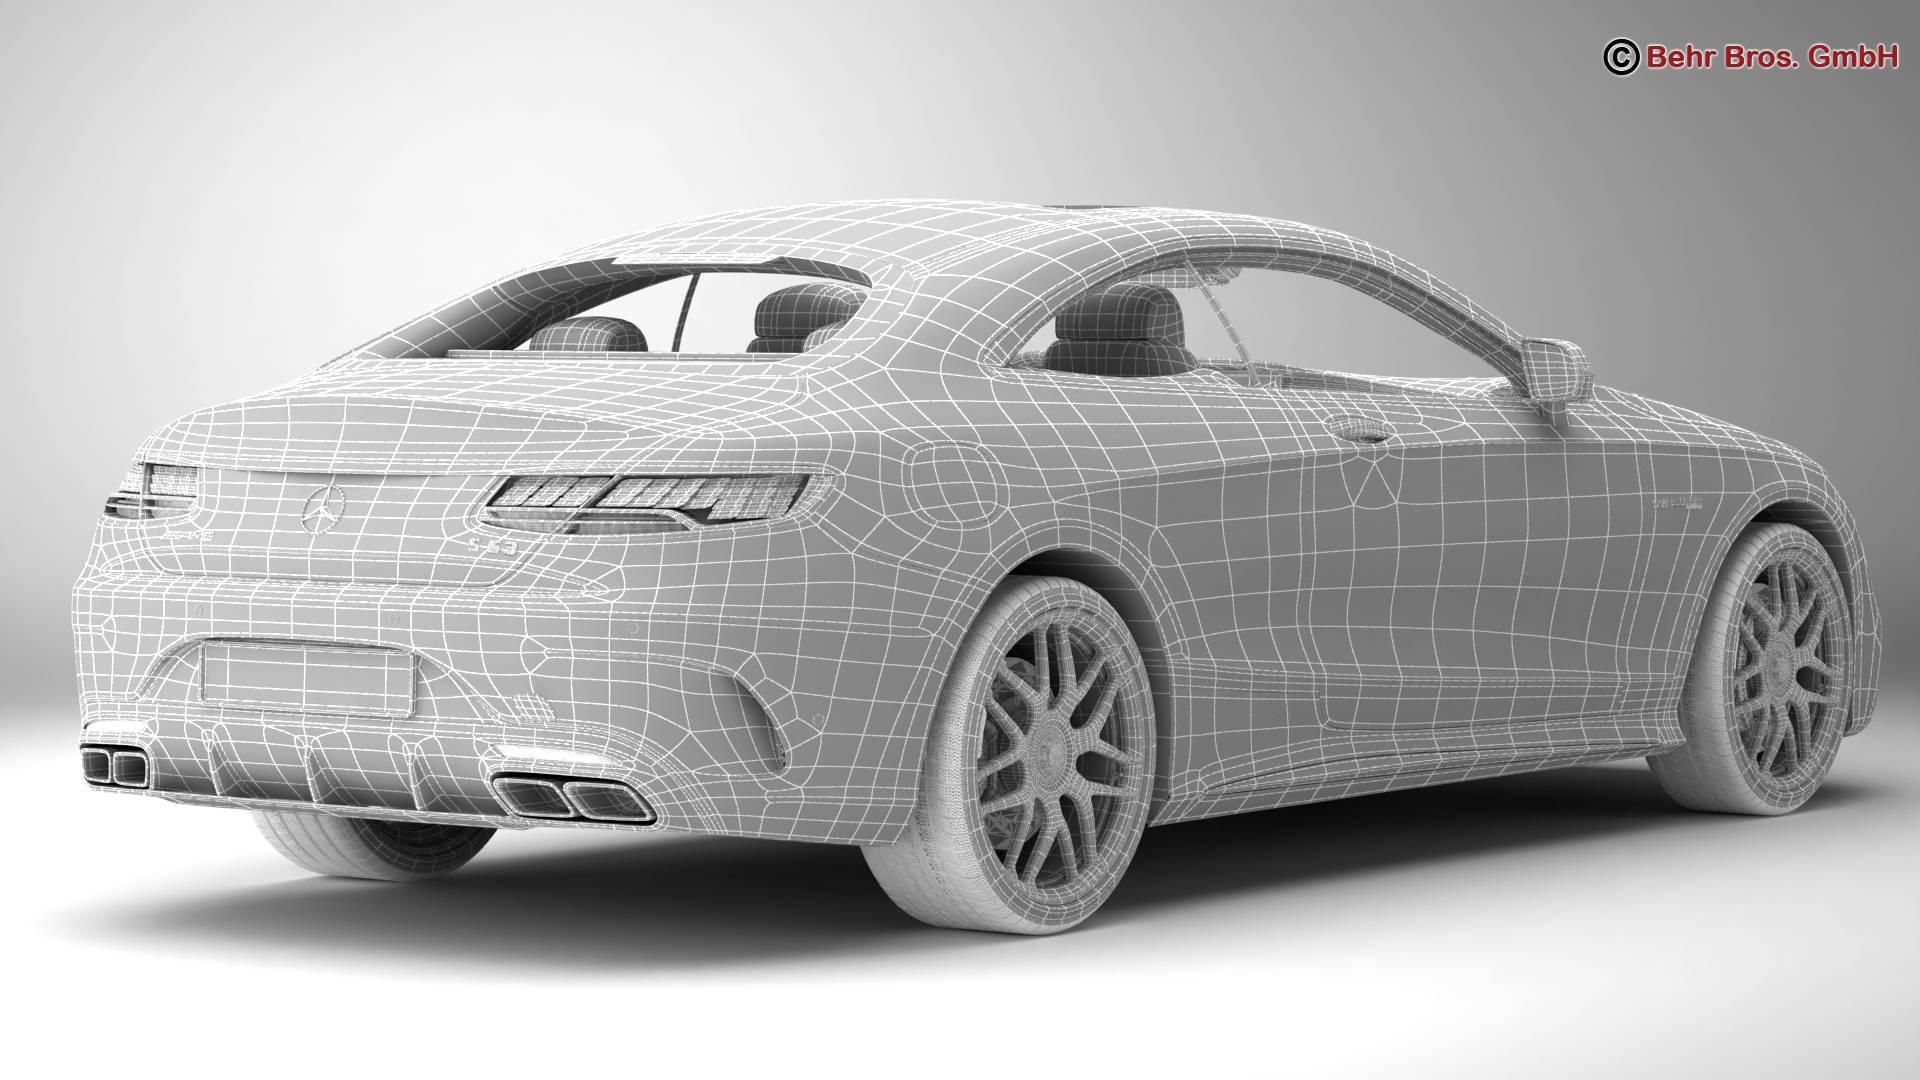 mercedes s class coupe amg s63 2018 3d model 3ds max fbx c4d lwo ma mb obj 274107